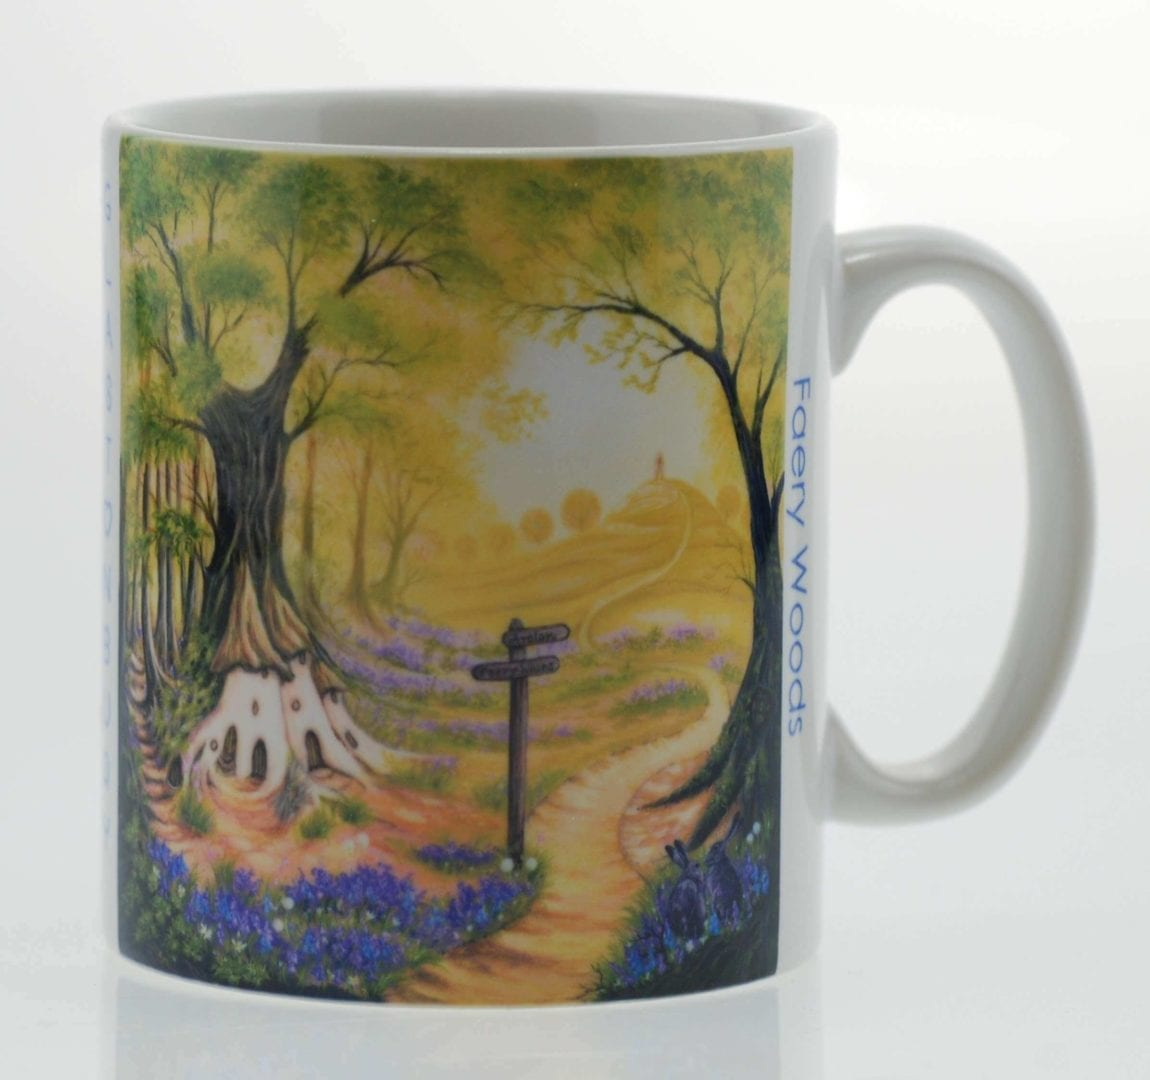 Faery Woods Mug